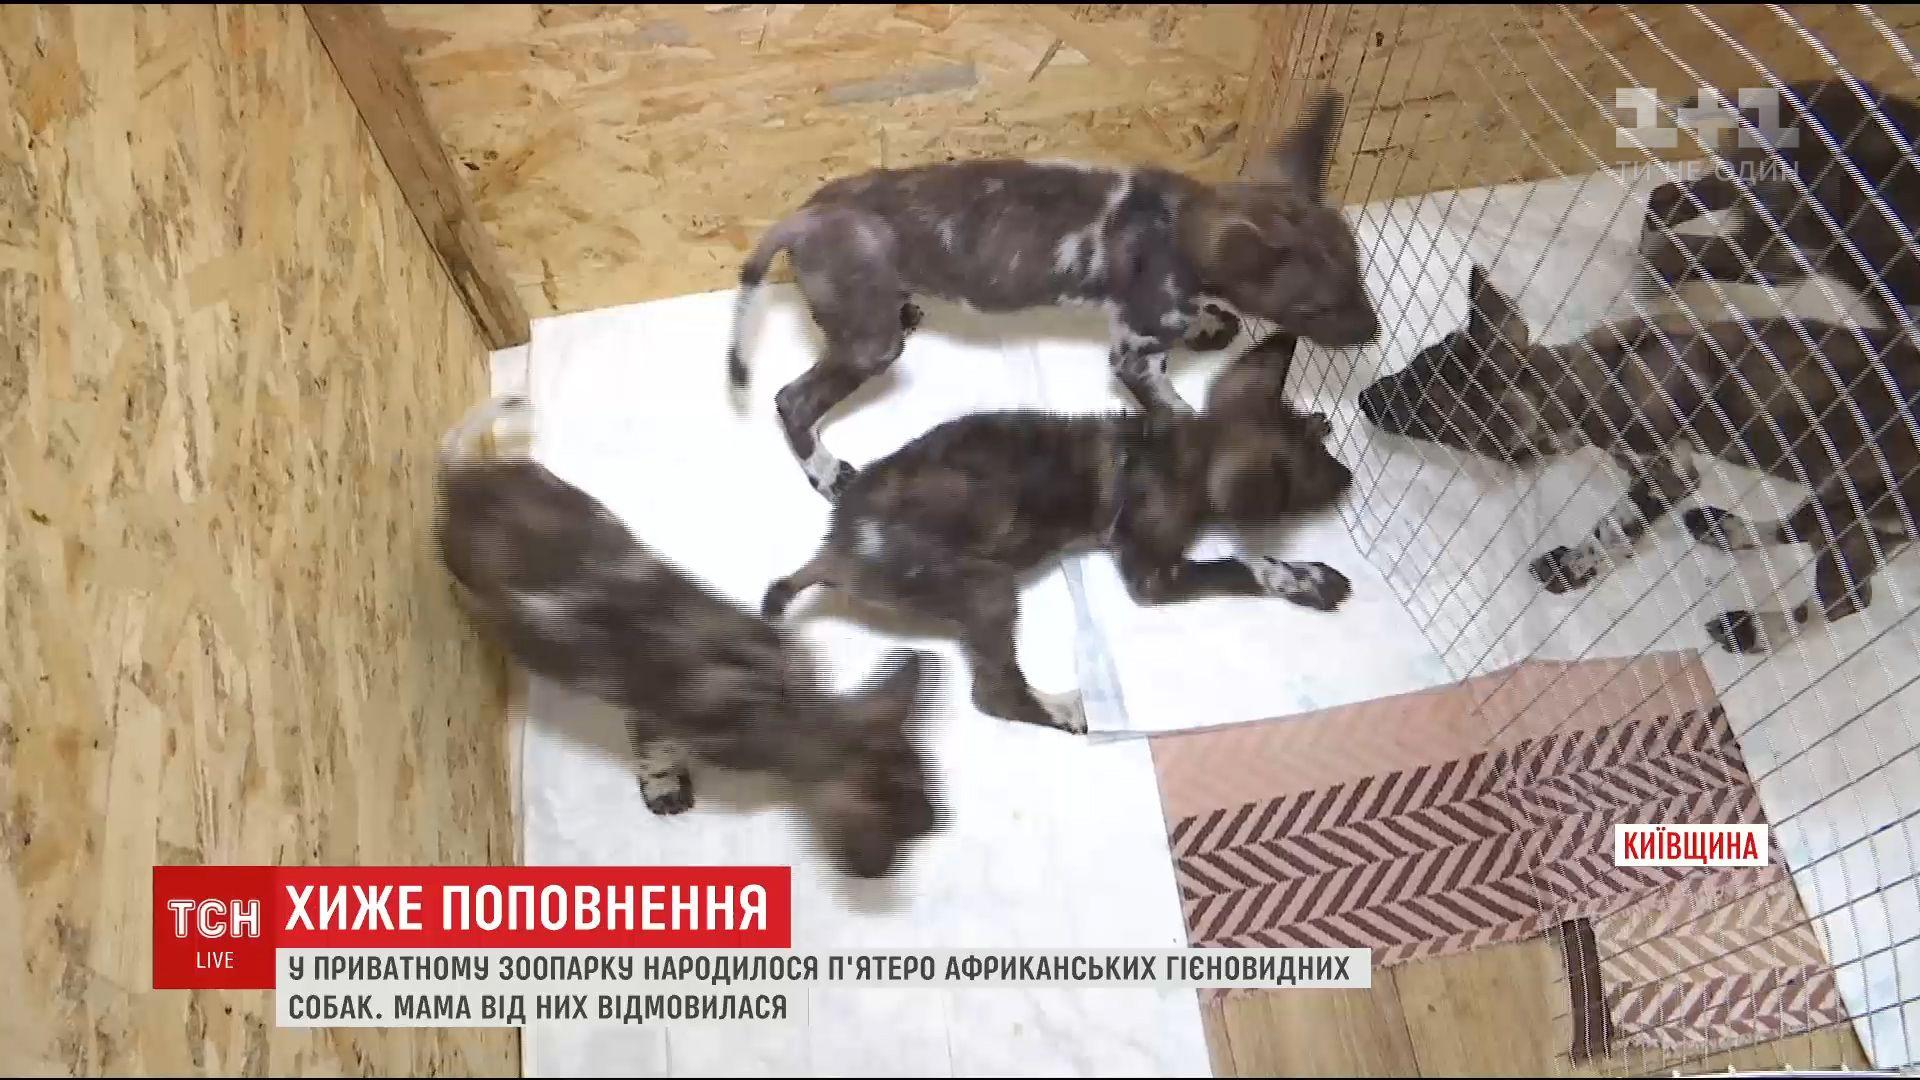 П'ятеро африканських гиено-видних собак народилося в приватному зоопарку під Києвом /